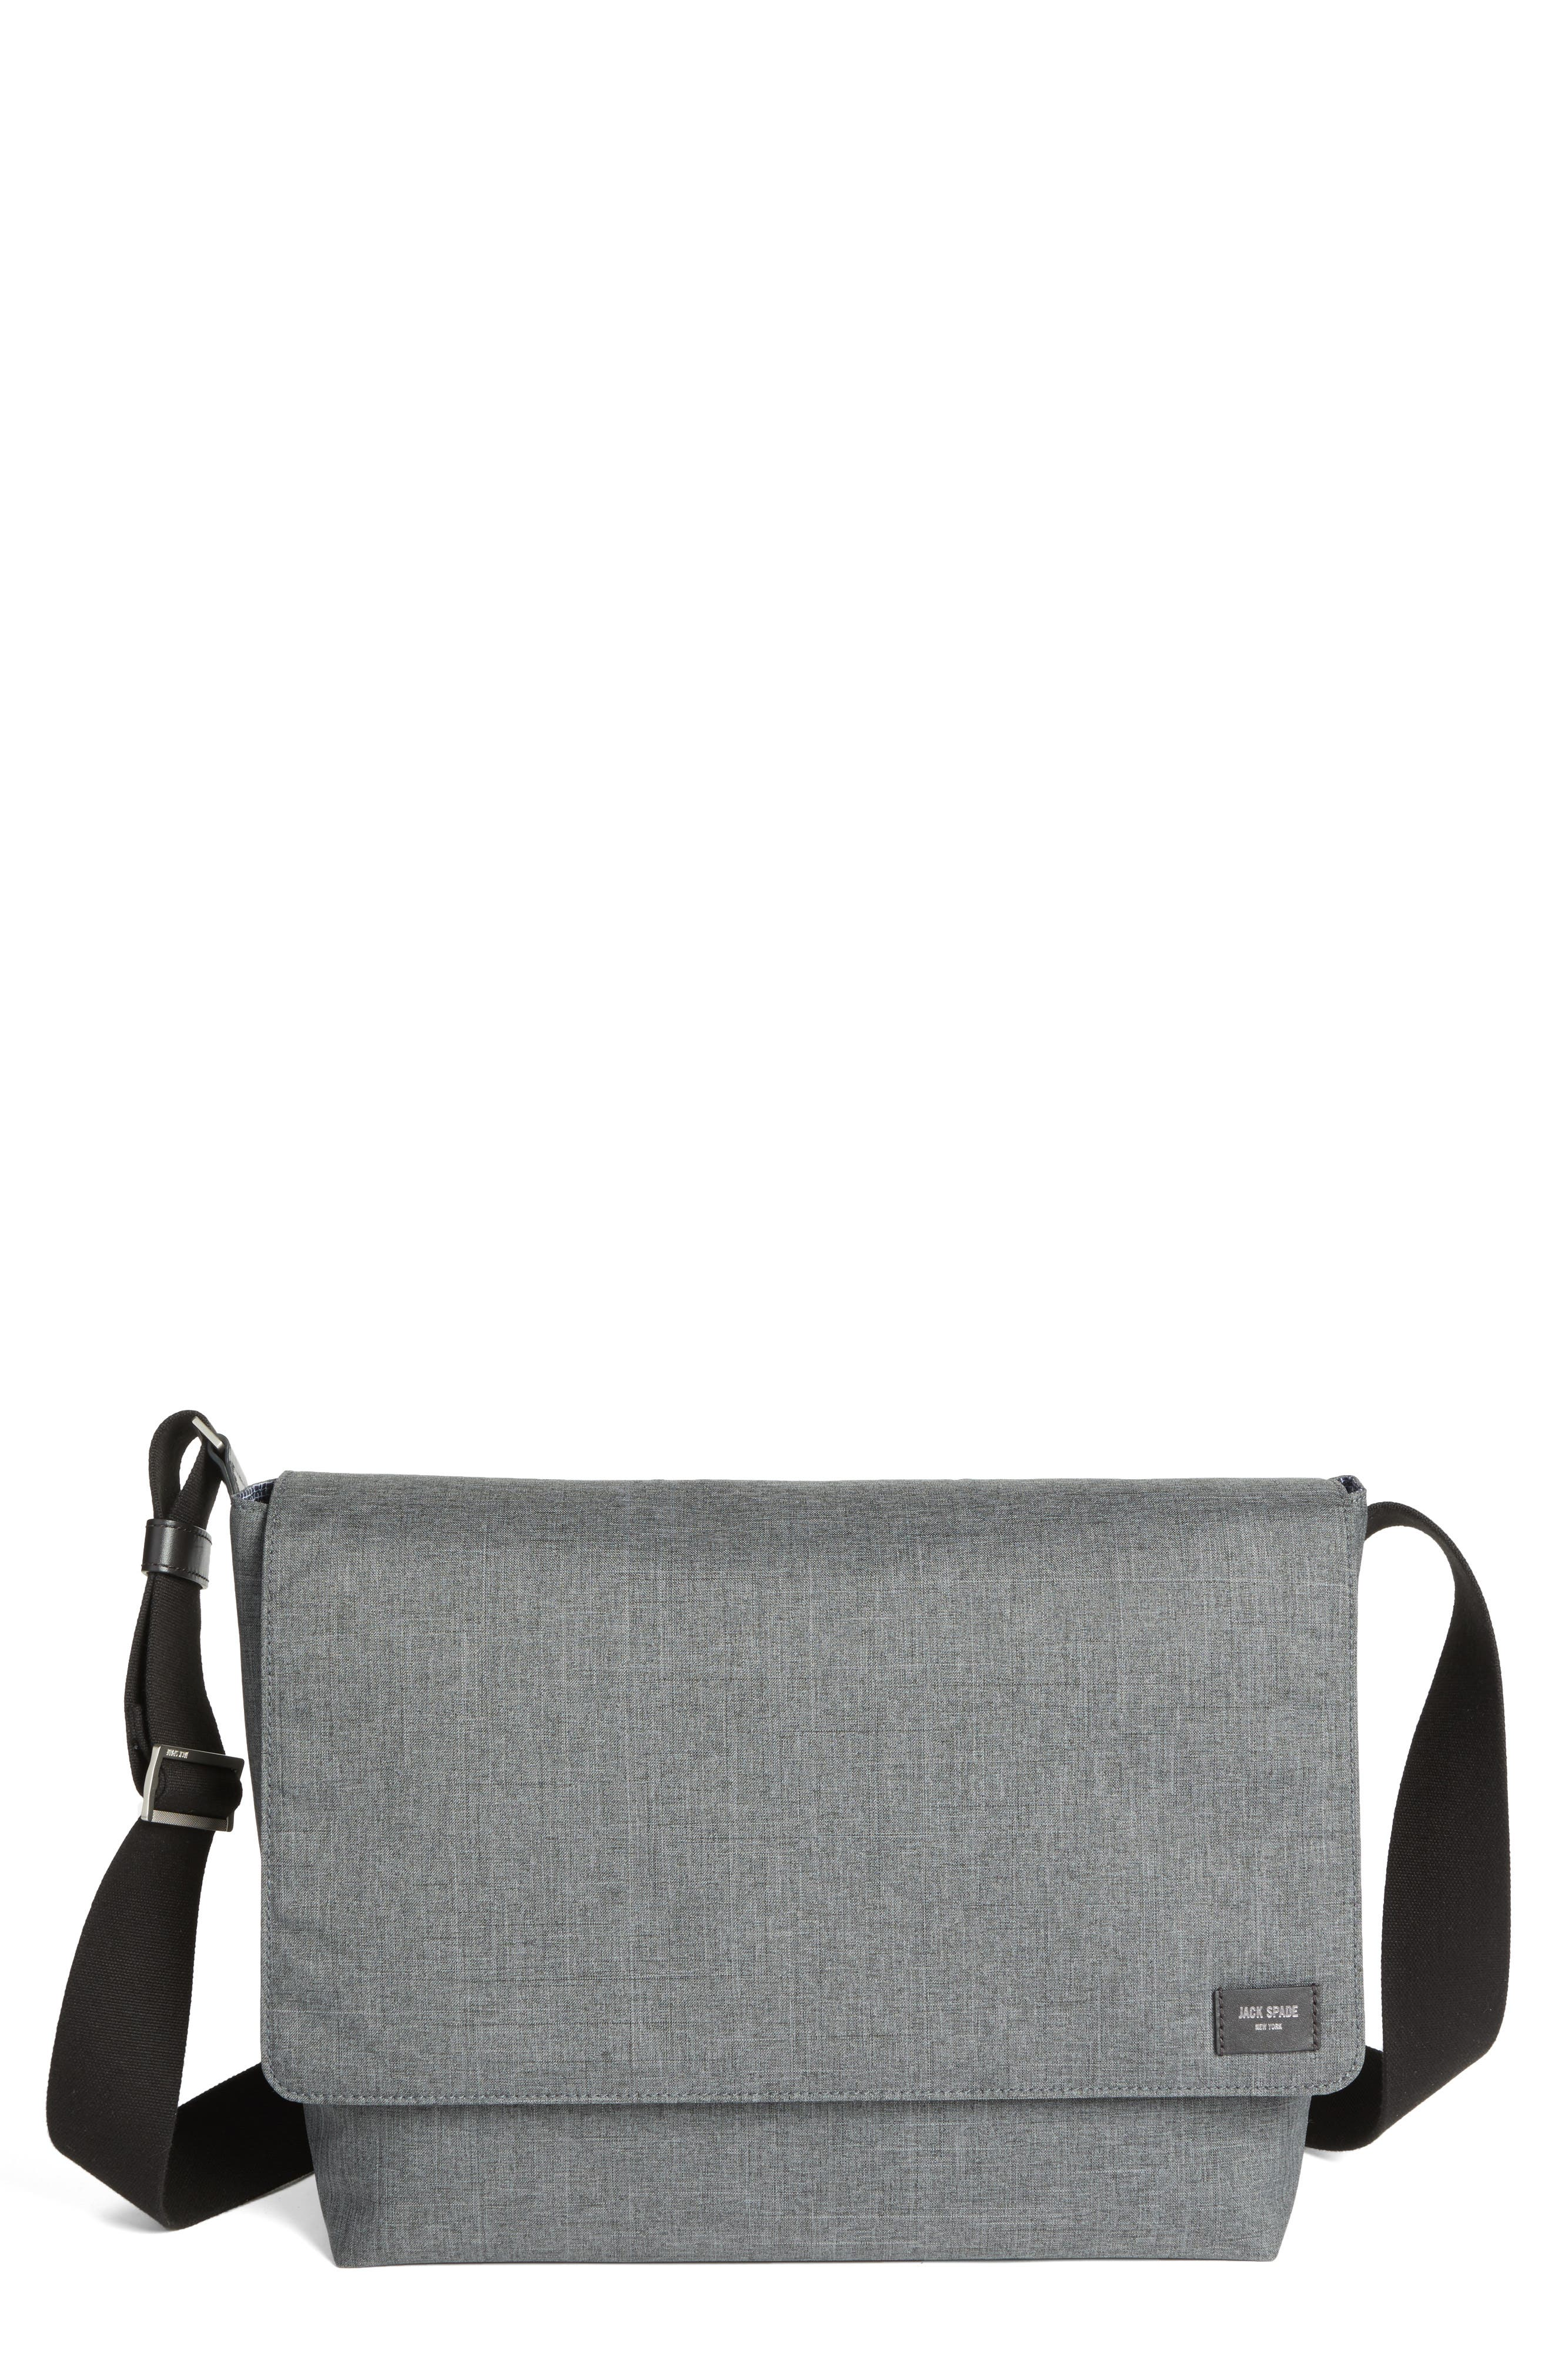 Jack Spade Tech Oxford Messenger Bag